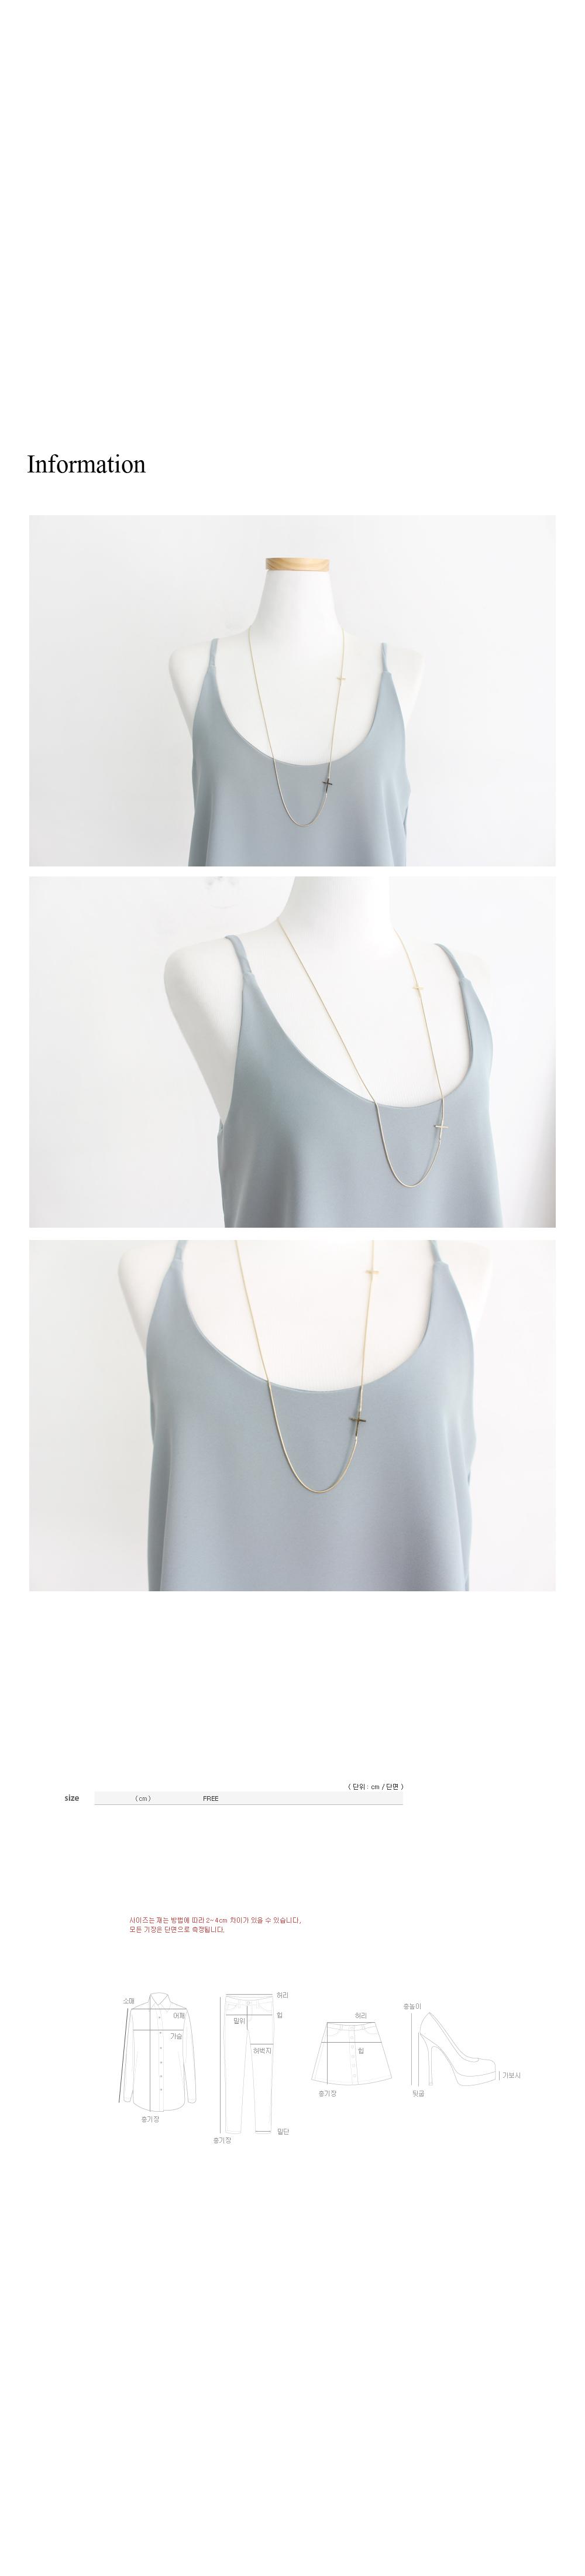 Agit necklace ; one color BEST ♥